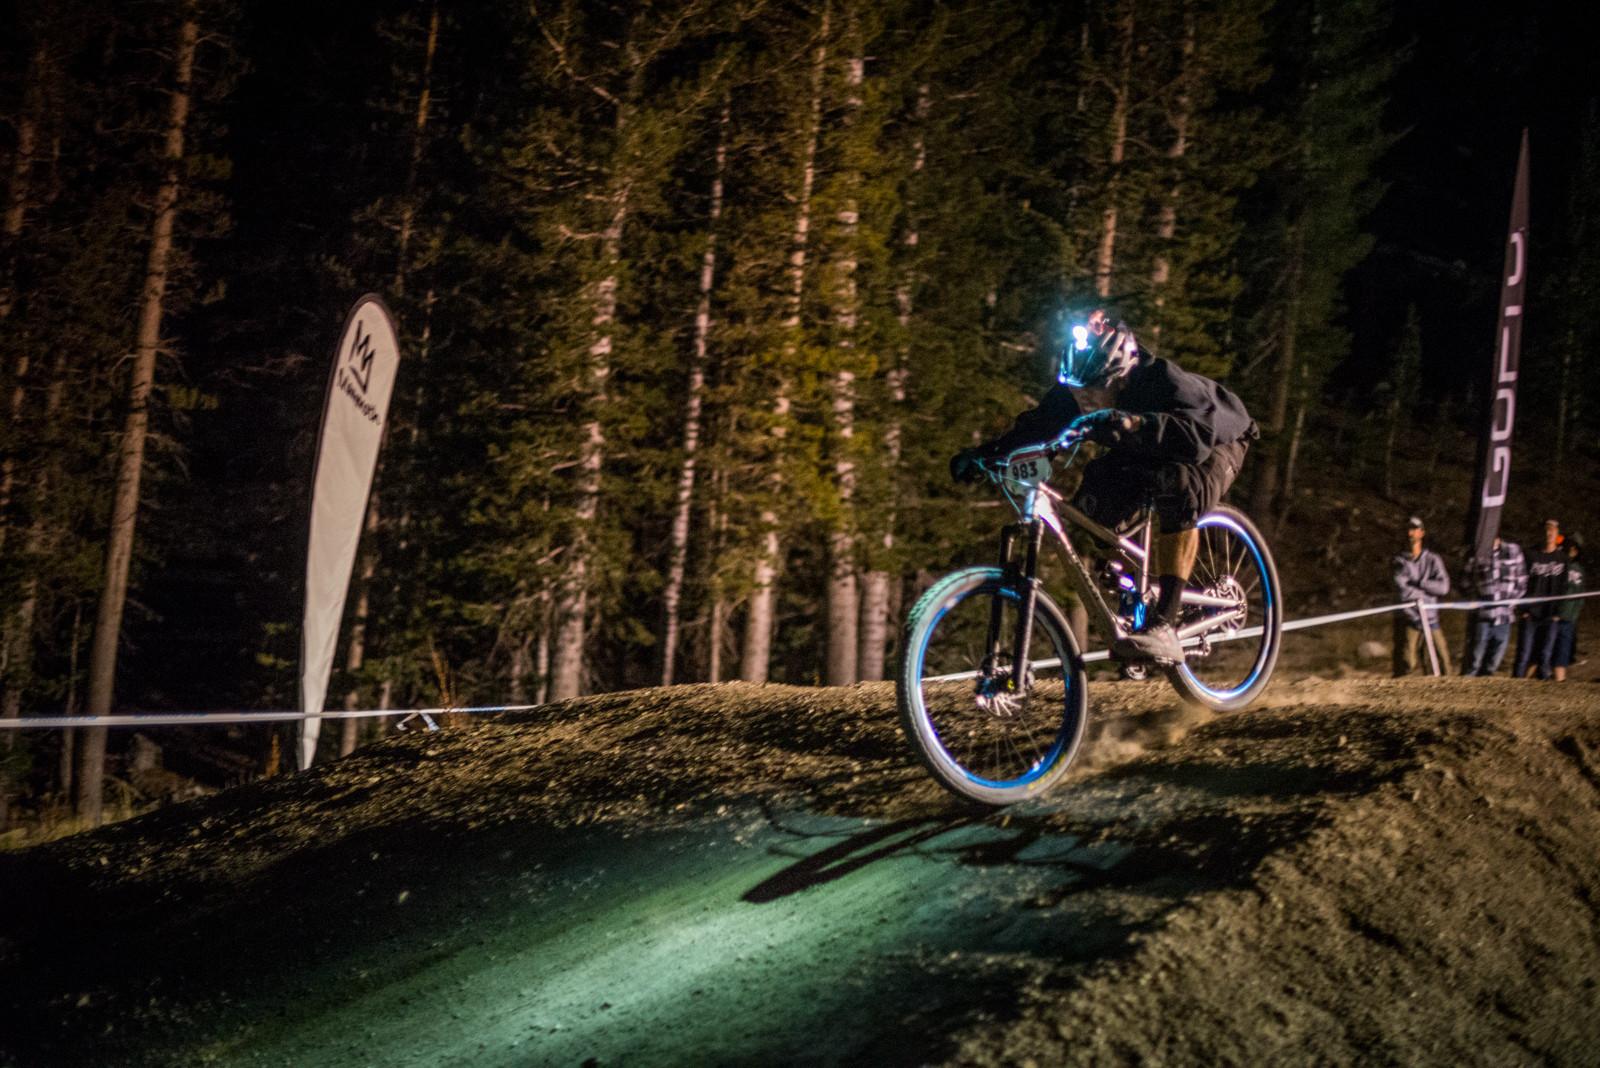 Vincent Kimber - Mammoth Mountain Kamikaze Bike Games Dual Slalom - Mountain Biking Pictures - Vital MTB